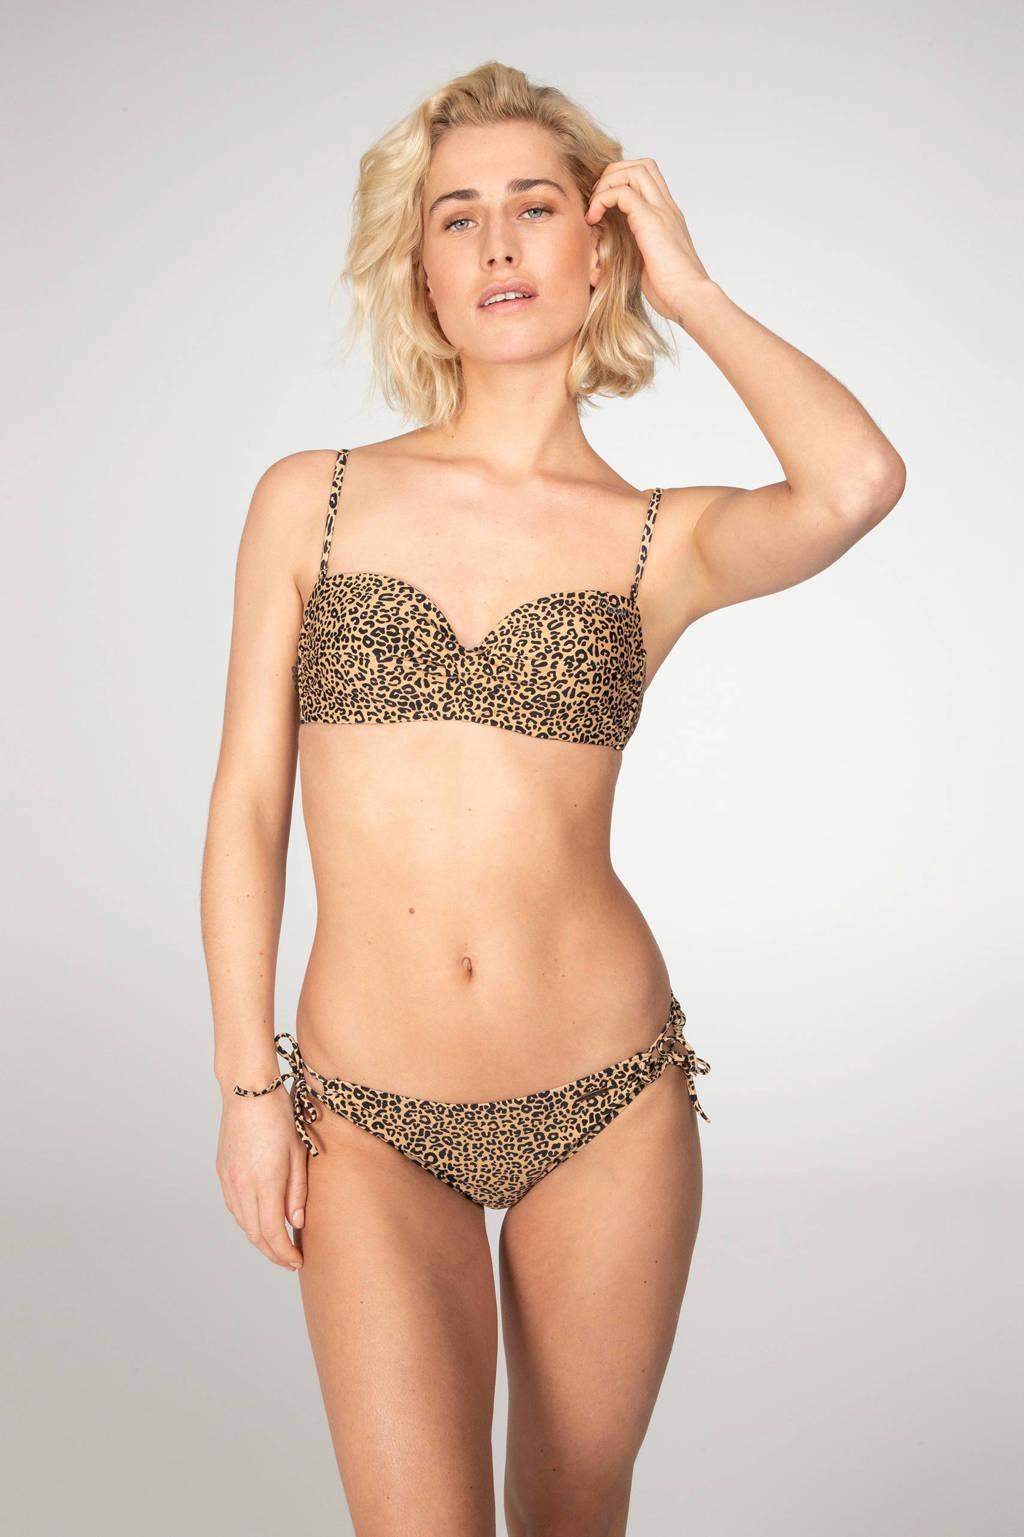 Protest strapless bandeau bikini Bay B-cup met panterprint beige/zwart, Beige/zwart